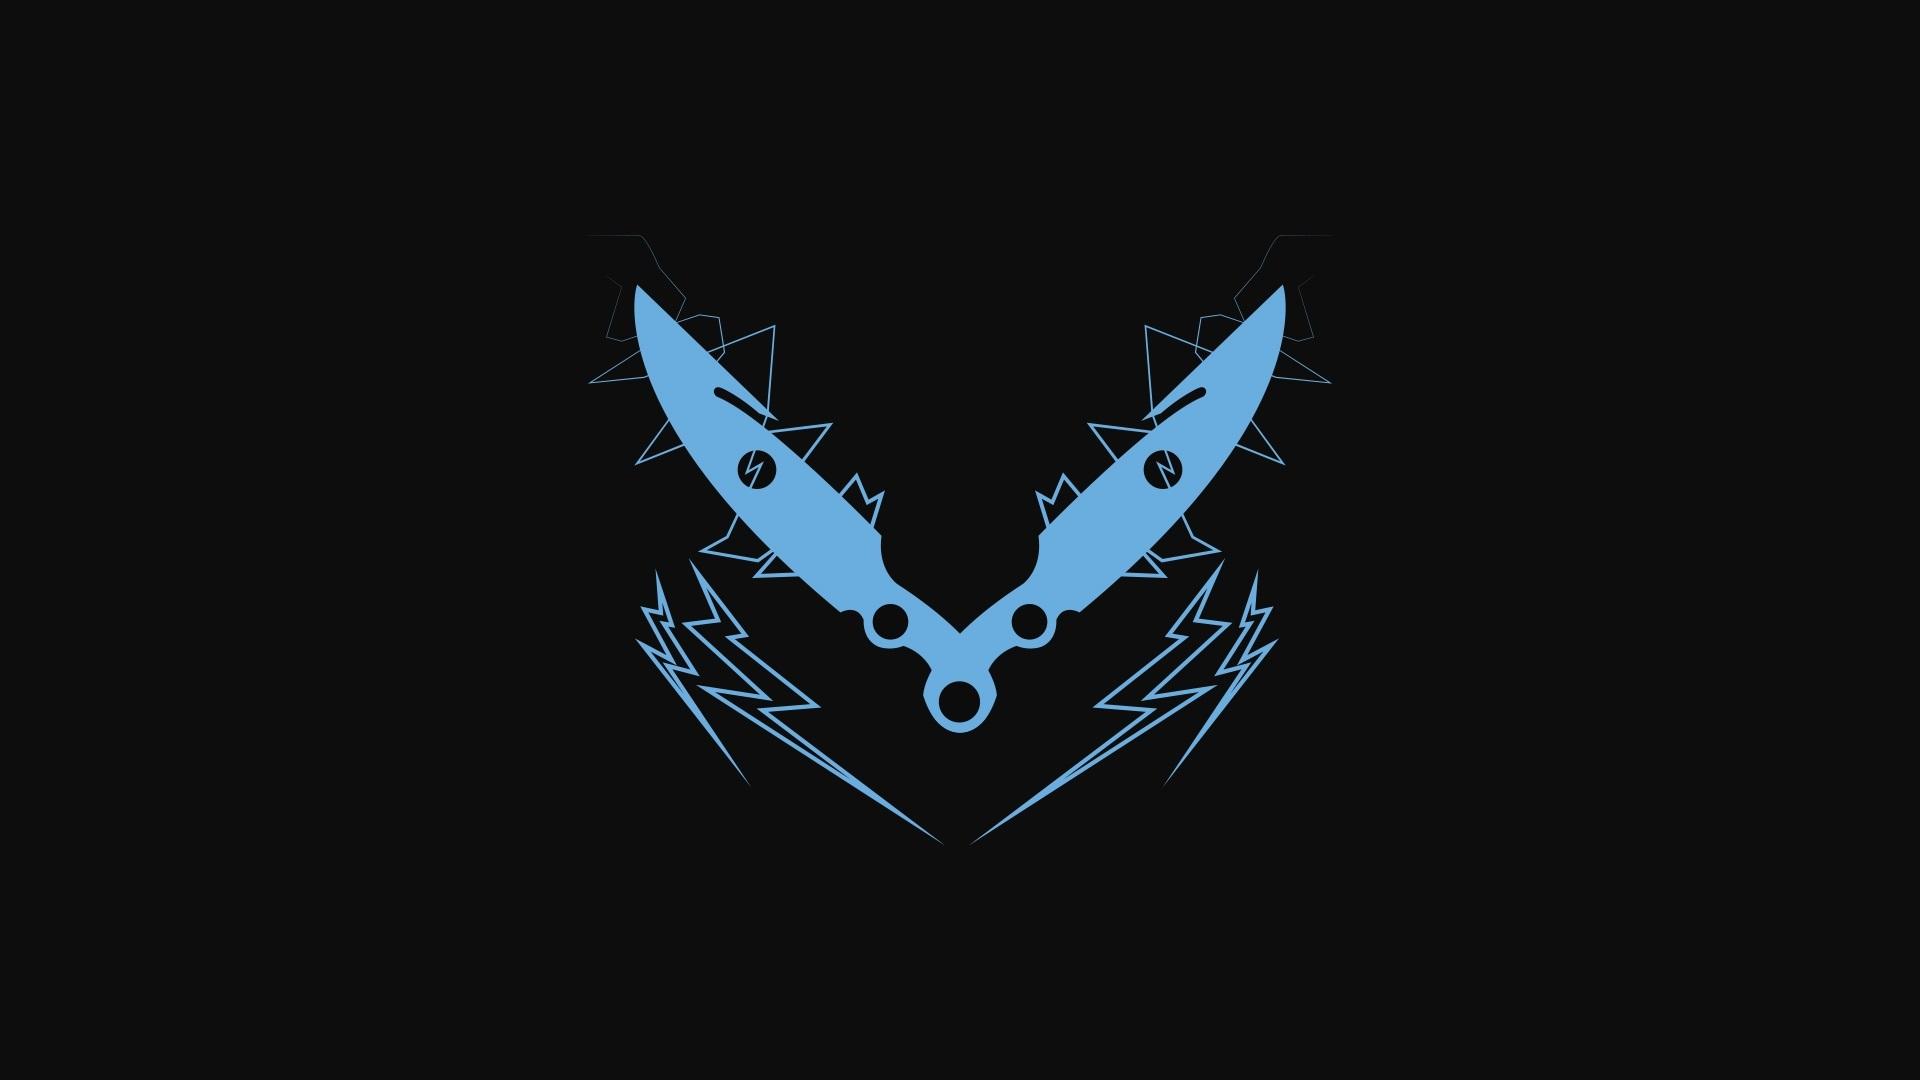 Bladedancer and Gunslinger Minimalist Wallpapers DestinyTheGame 1920x1080